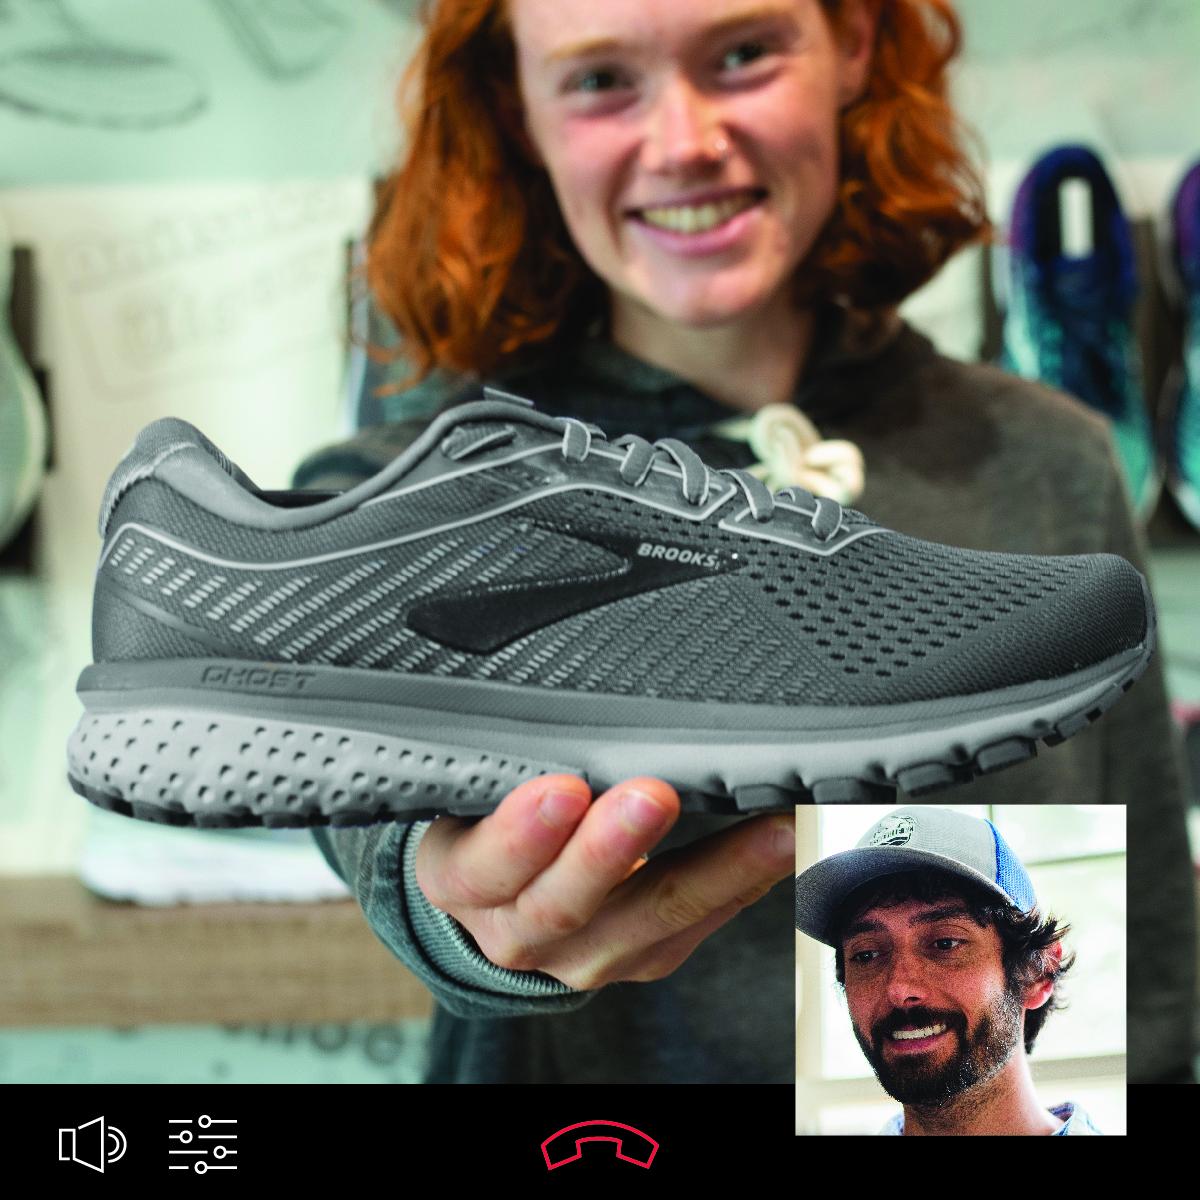 Virtual fitting shoe selection